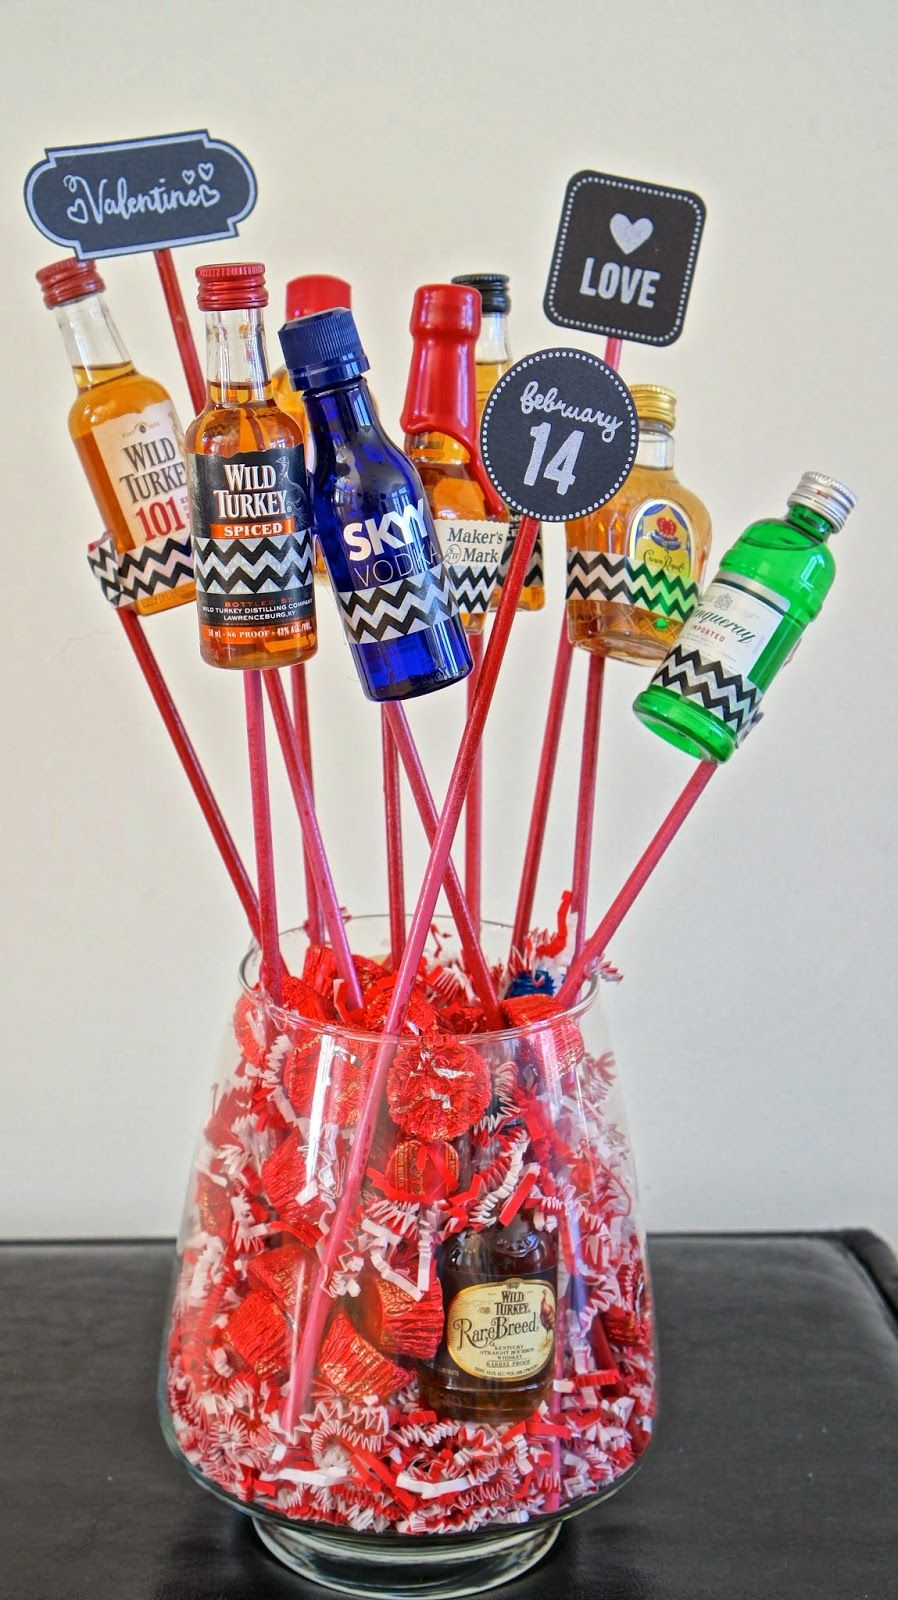 diy manly valentines booze bouquet foodfashionhomecom - Manly Valentine Gifts